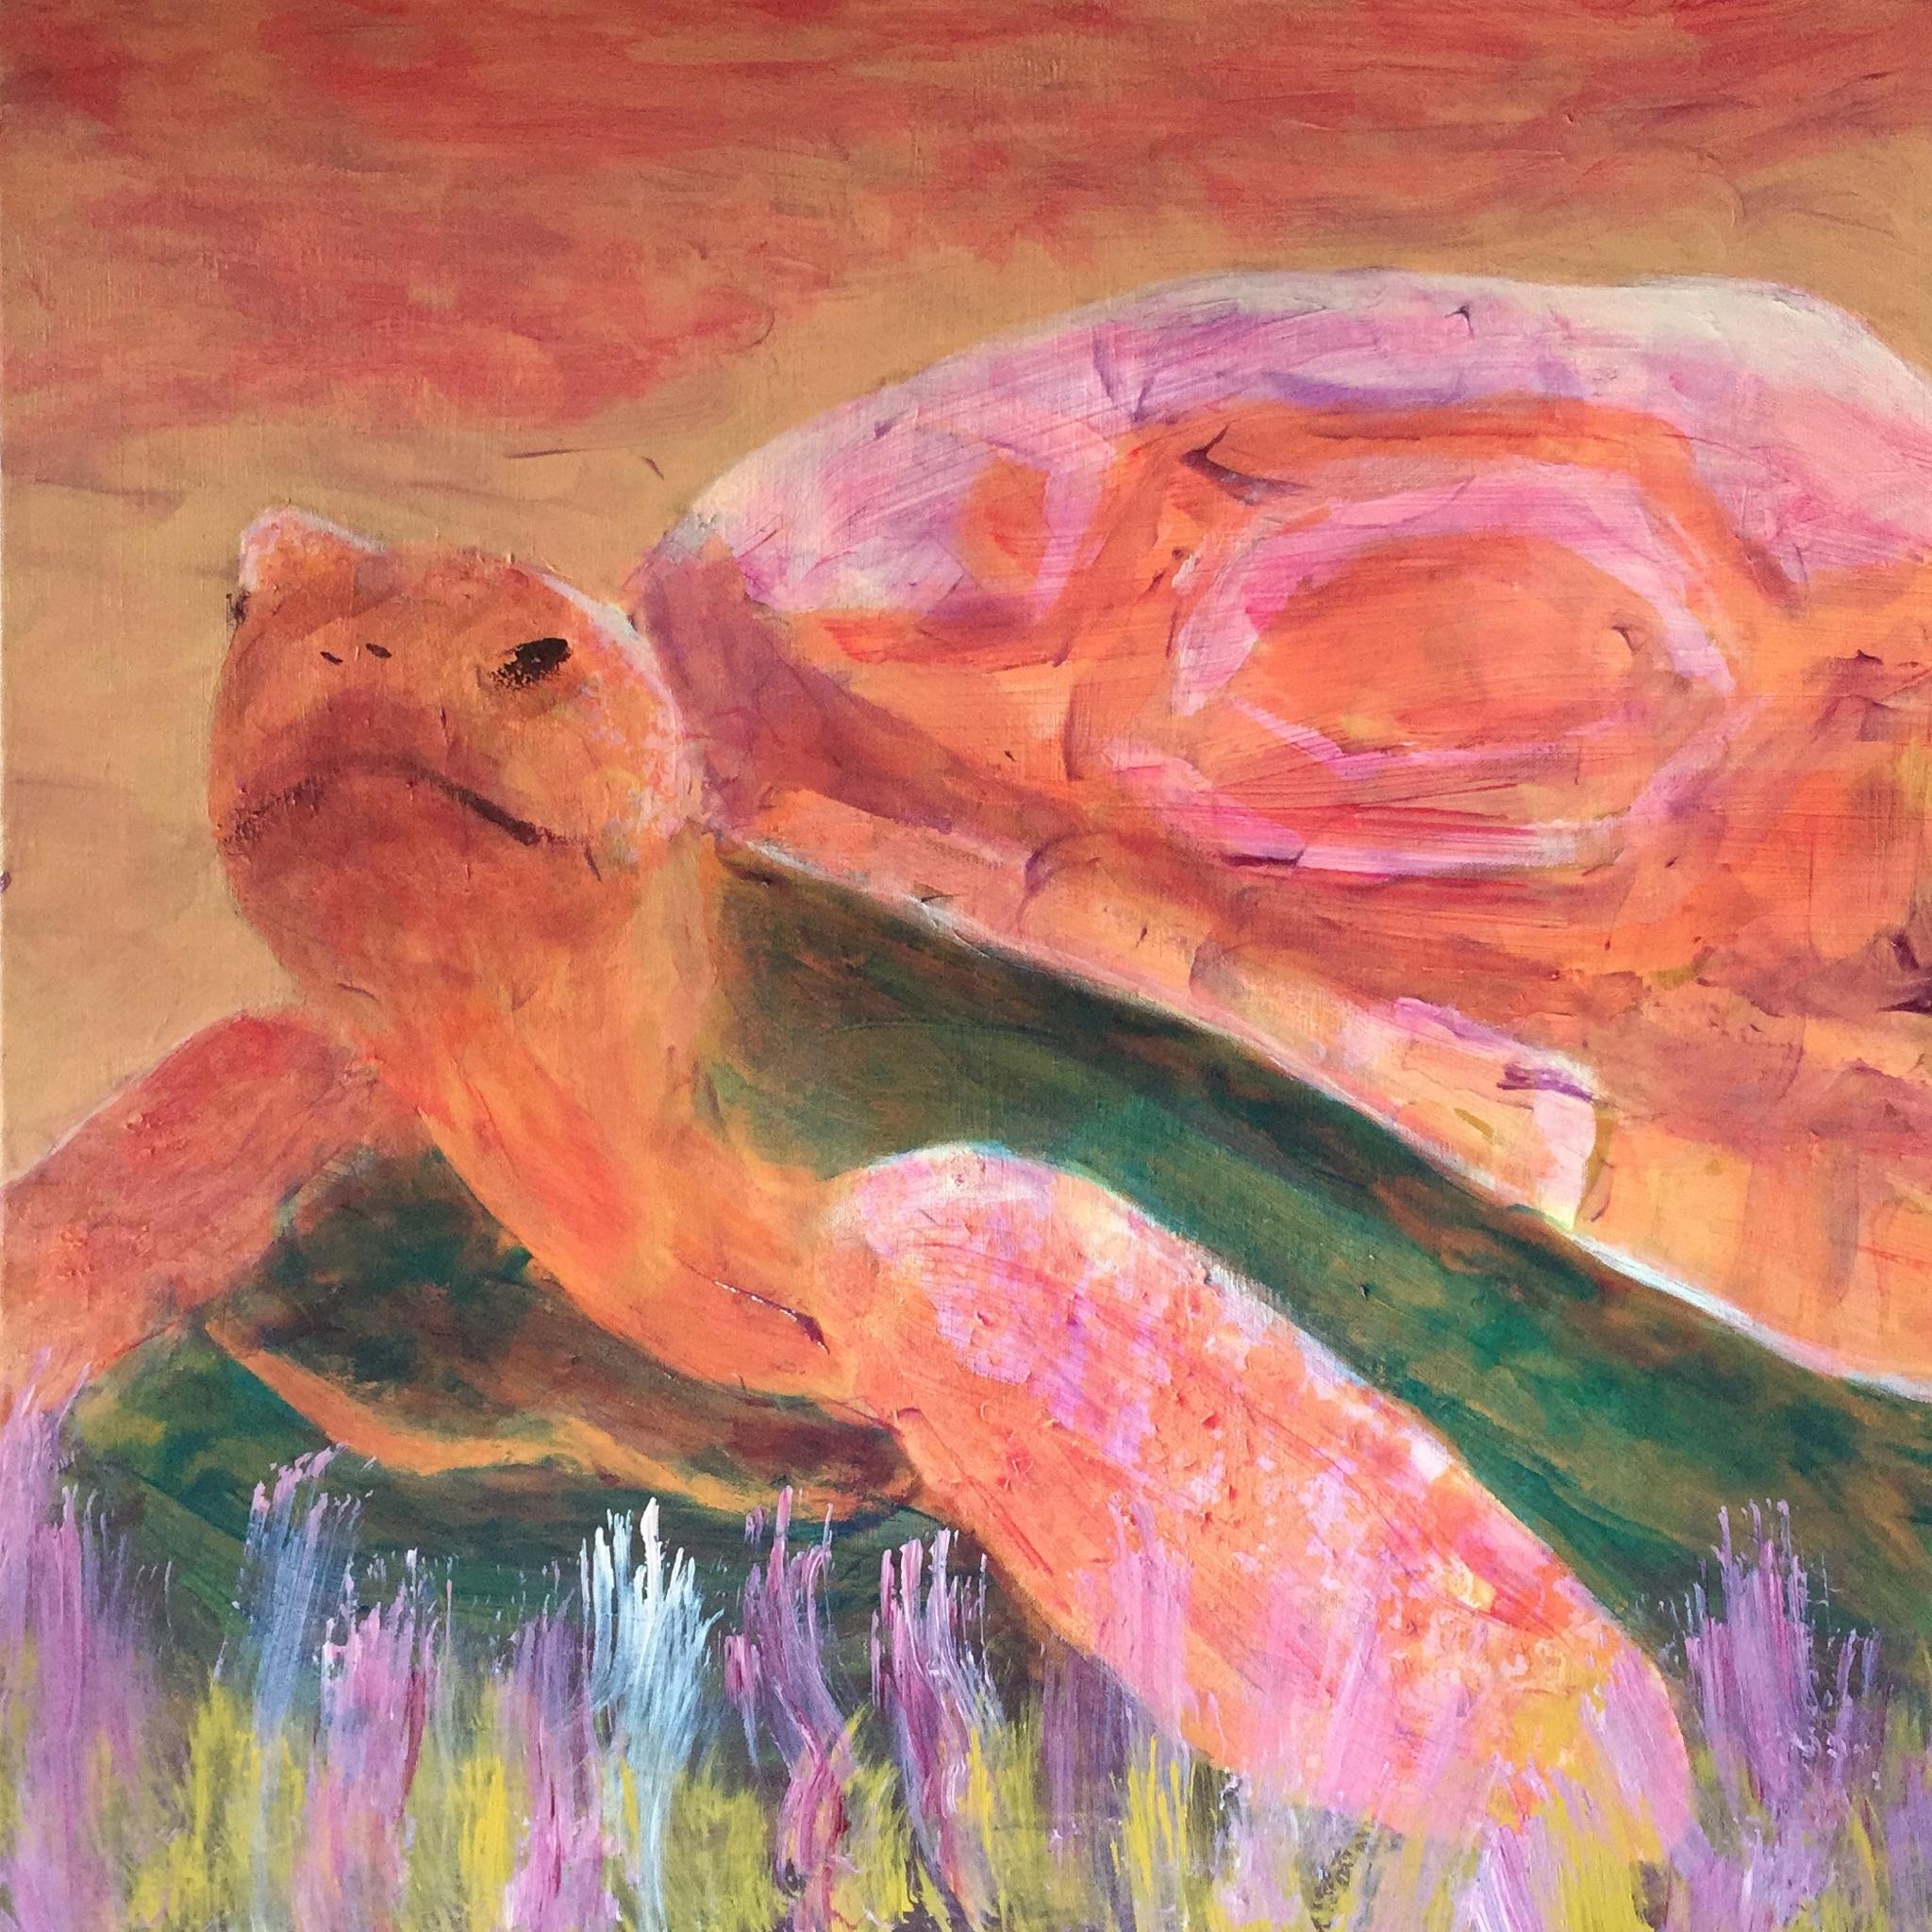 Tortoise - - Original for Sale - Prints Available